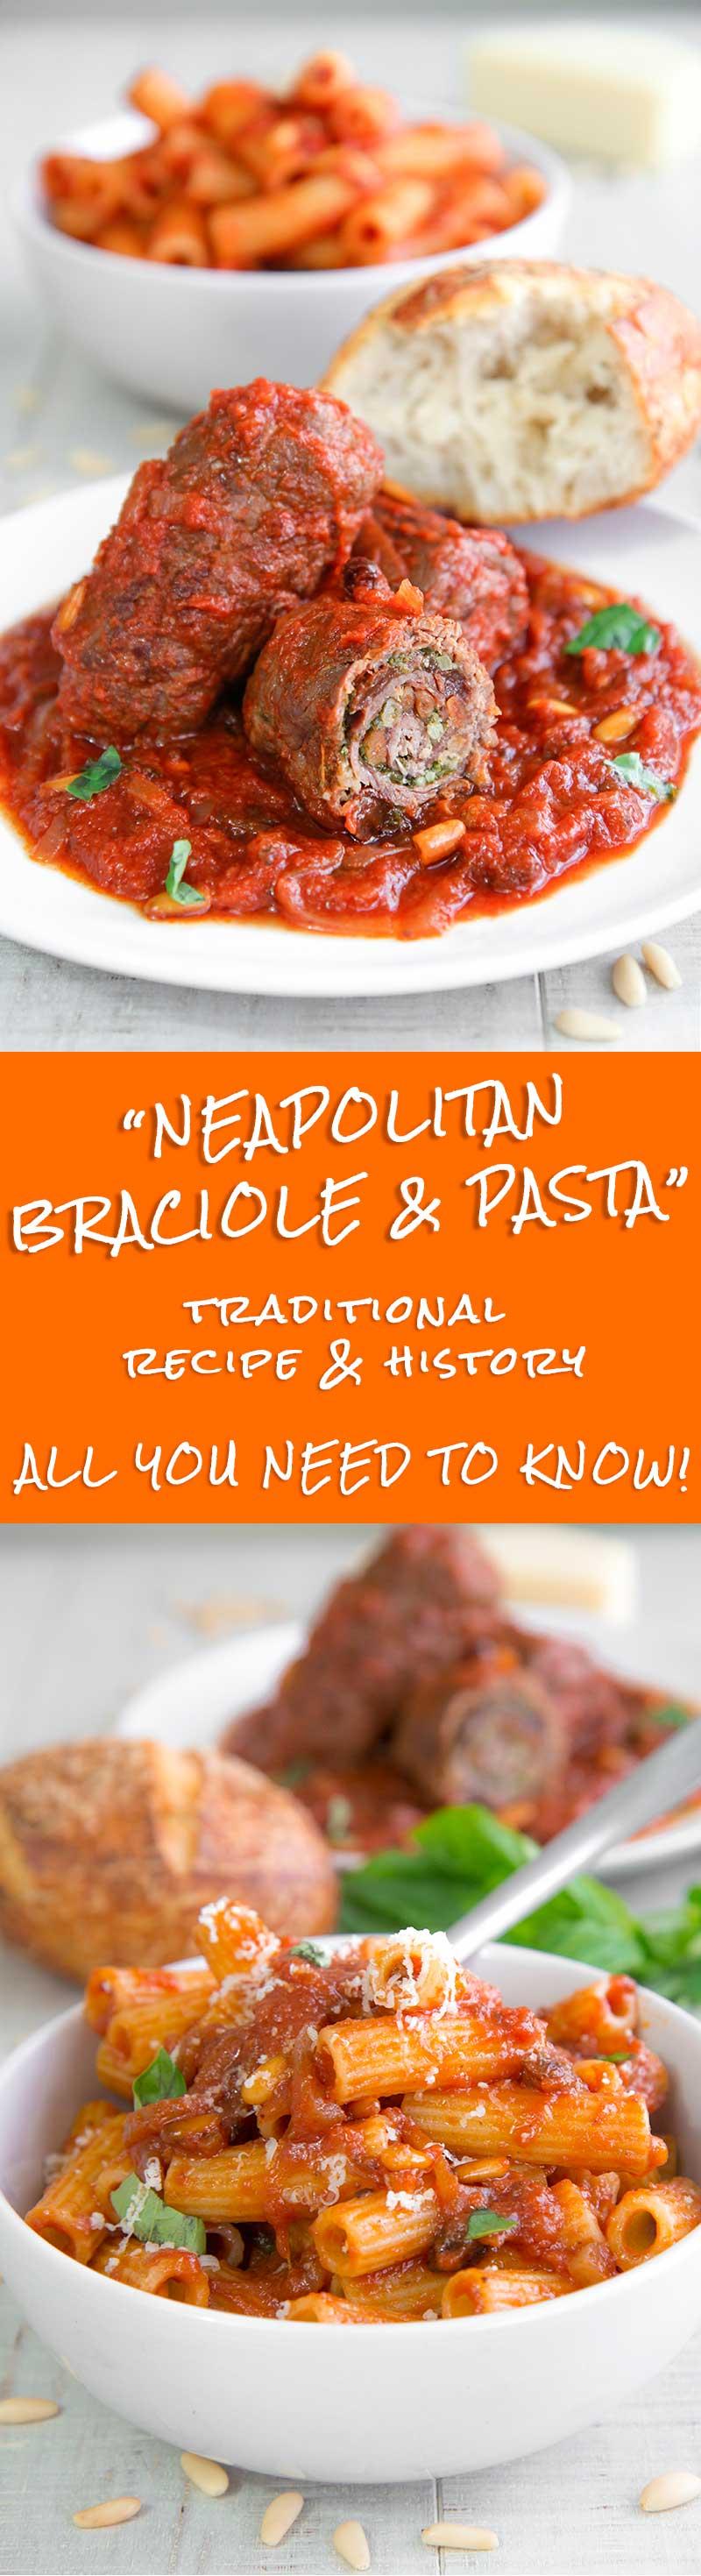 BRACIOLE NEAPOLITAN-STYLE recipe & history - all you need to know!